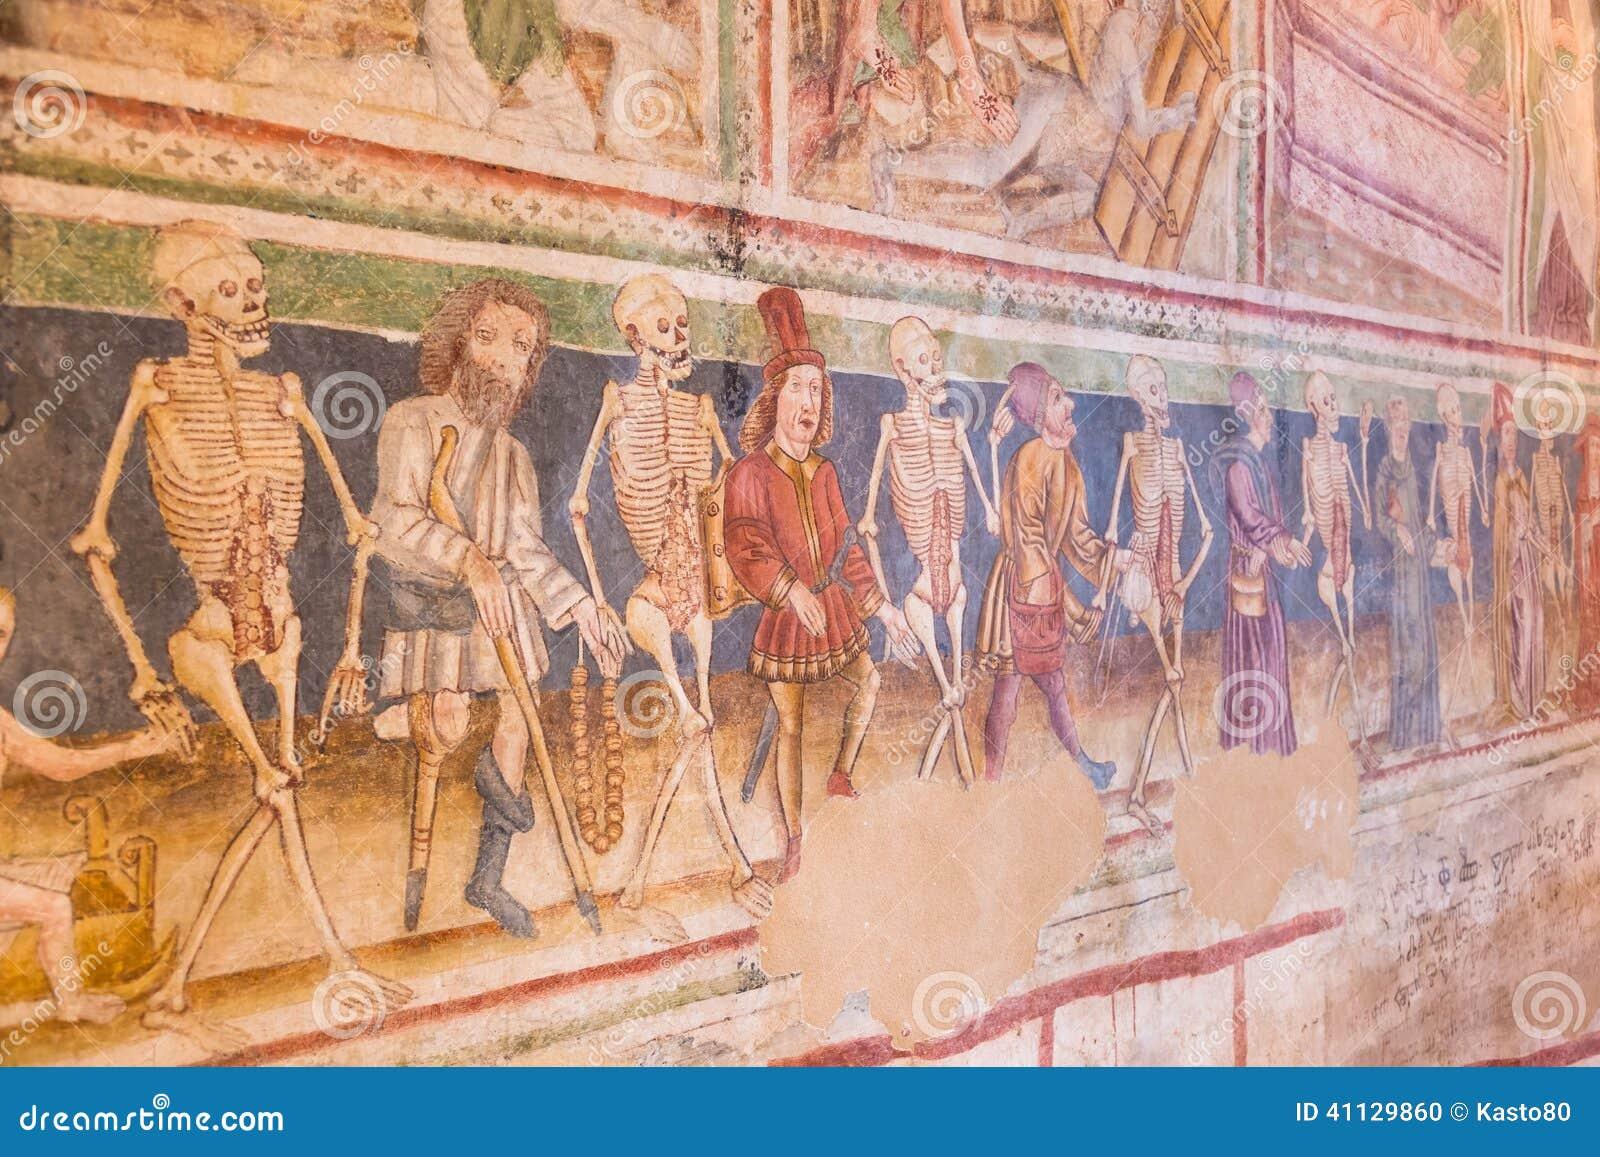 Person painting wall - Danse Macabre Fresco Hrastovlje Slovenia Stock Illustration Image